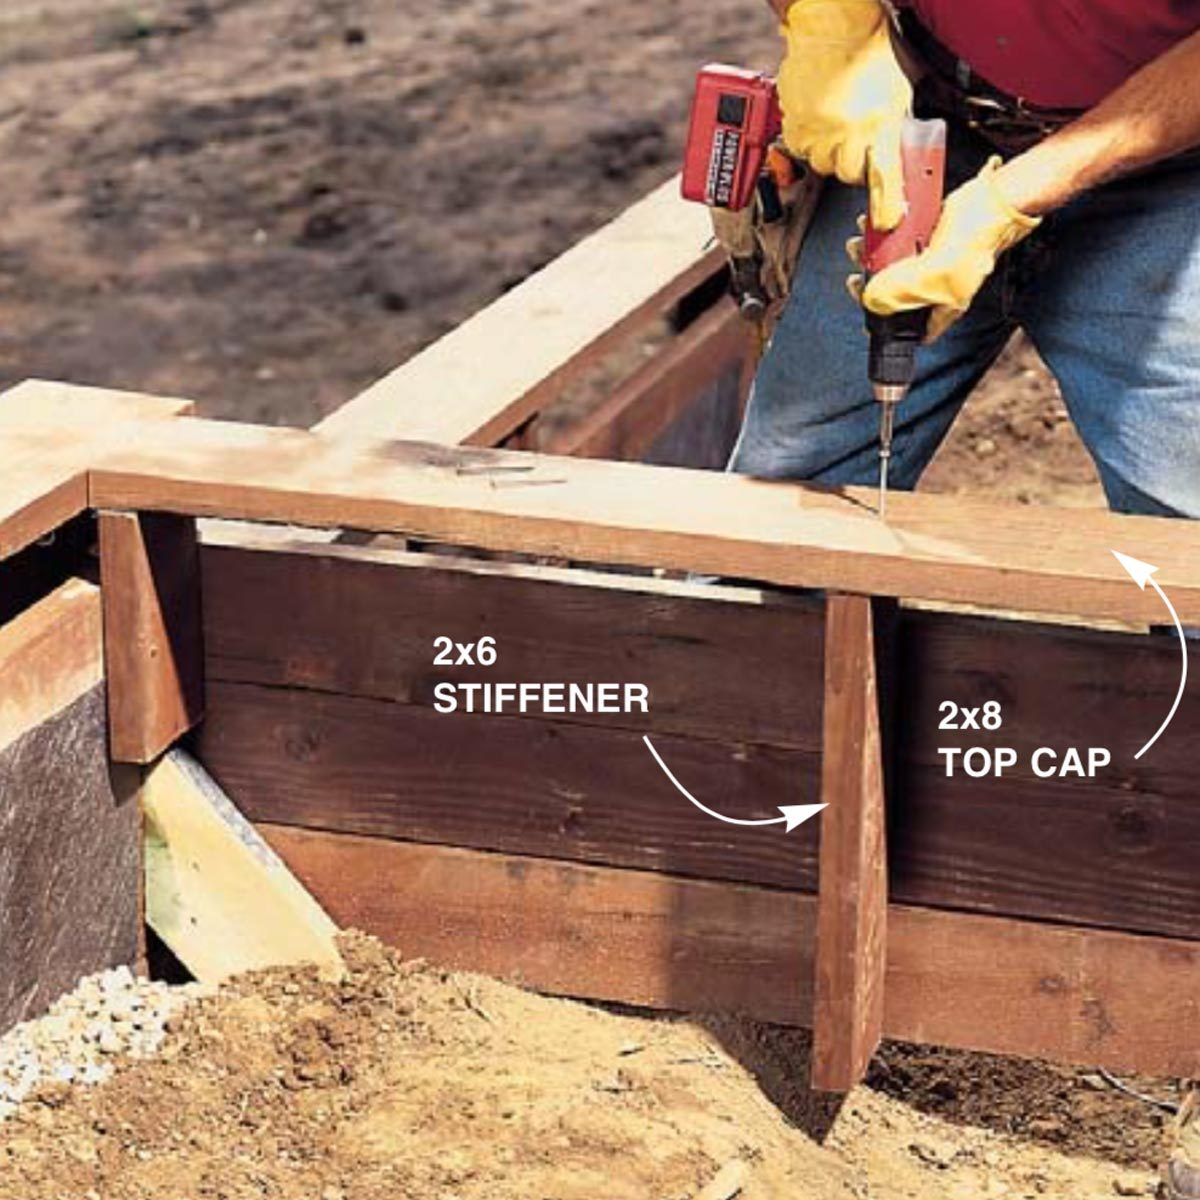 How to Build a Treated Wood Retaining Wall   Family Handyman